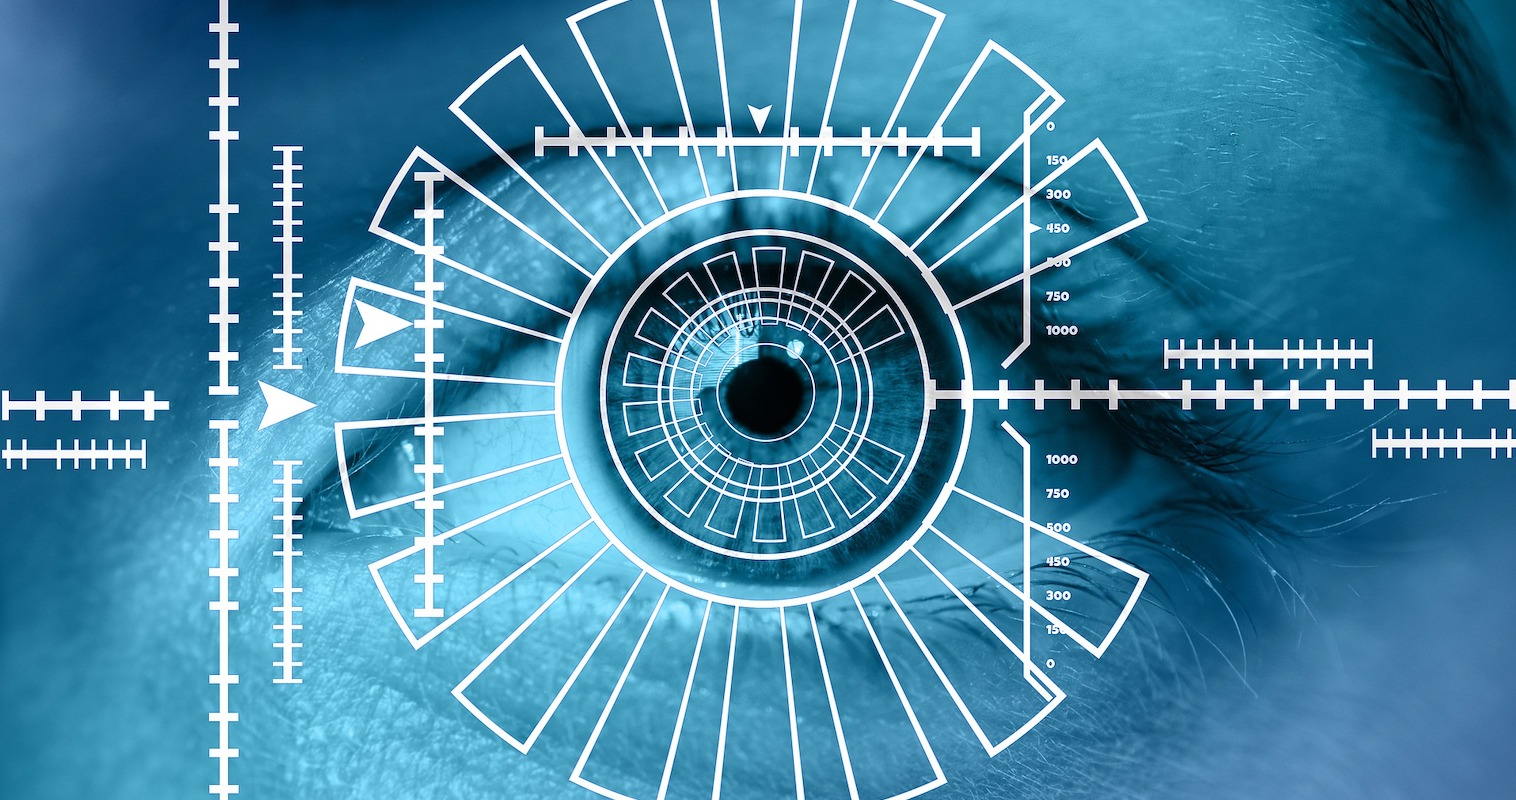 Dati biometrici dei dipendenti